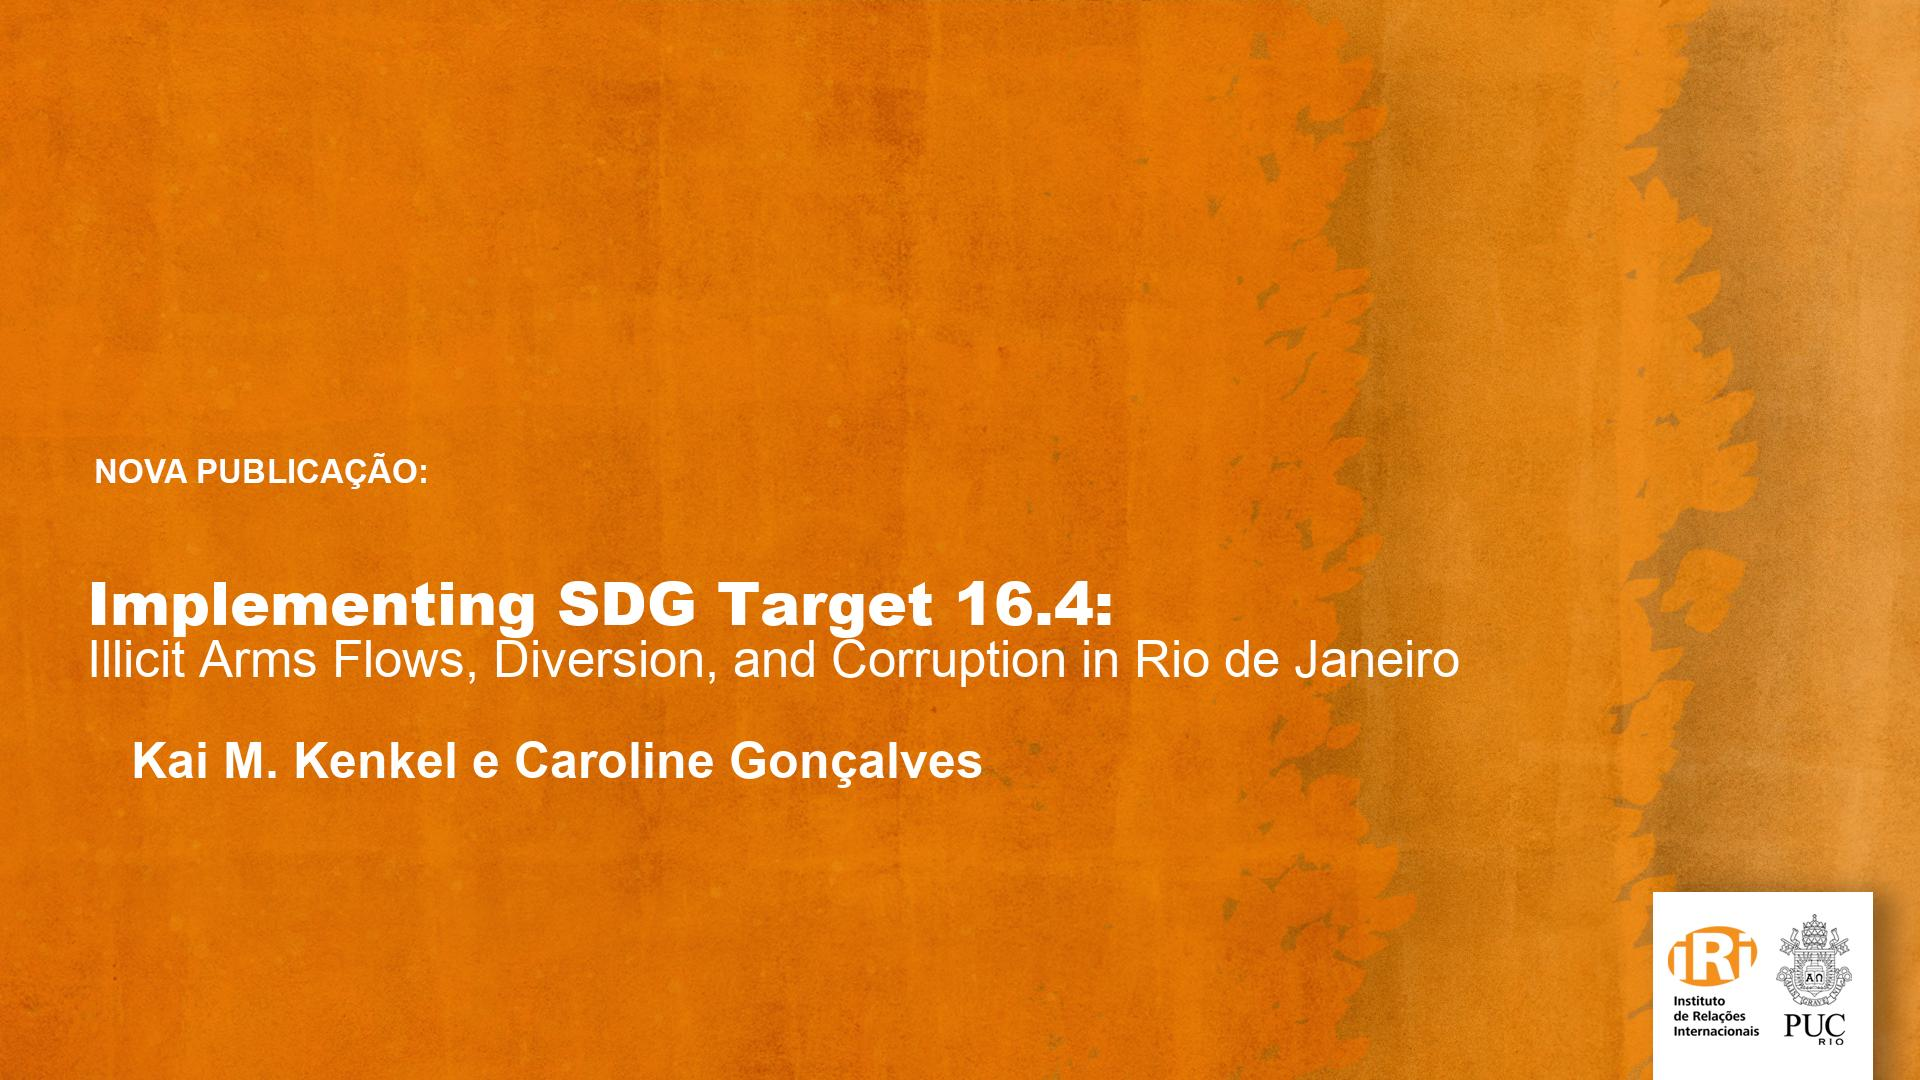 Implementing SDG Target 16.4: Illicit Arms Flows, Diversion, and Corruption in Rio de Janeiro